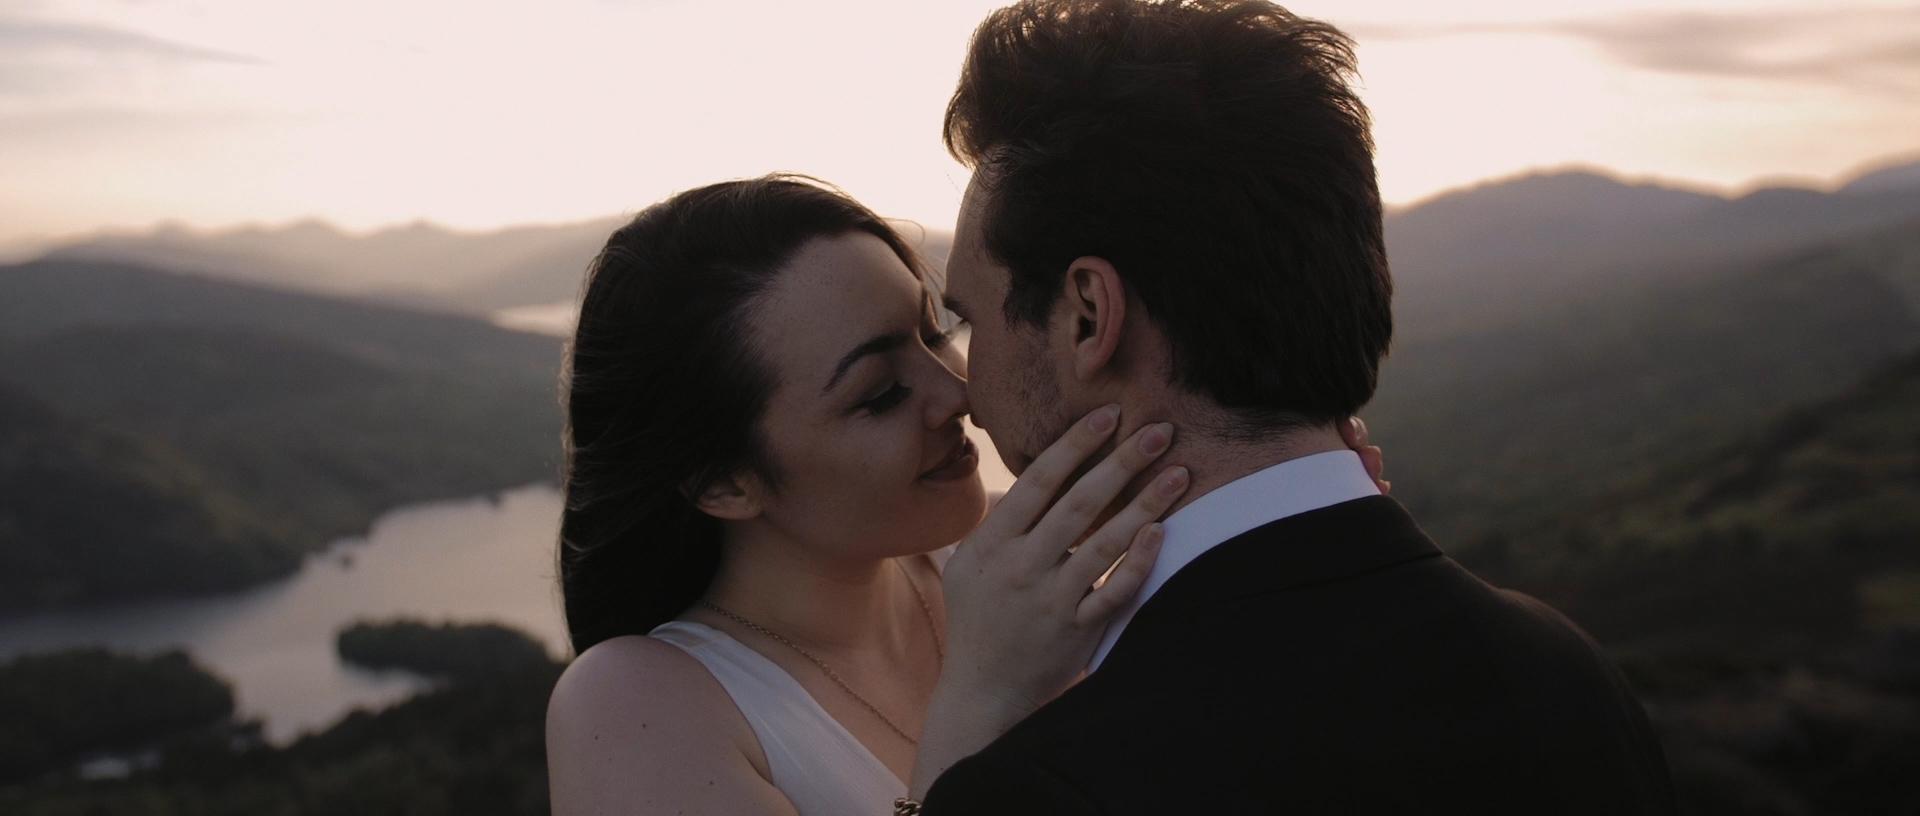 cambo-estate-wedding-videographer_LL_09.jpg